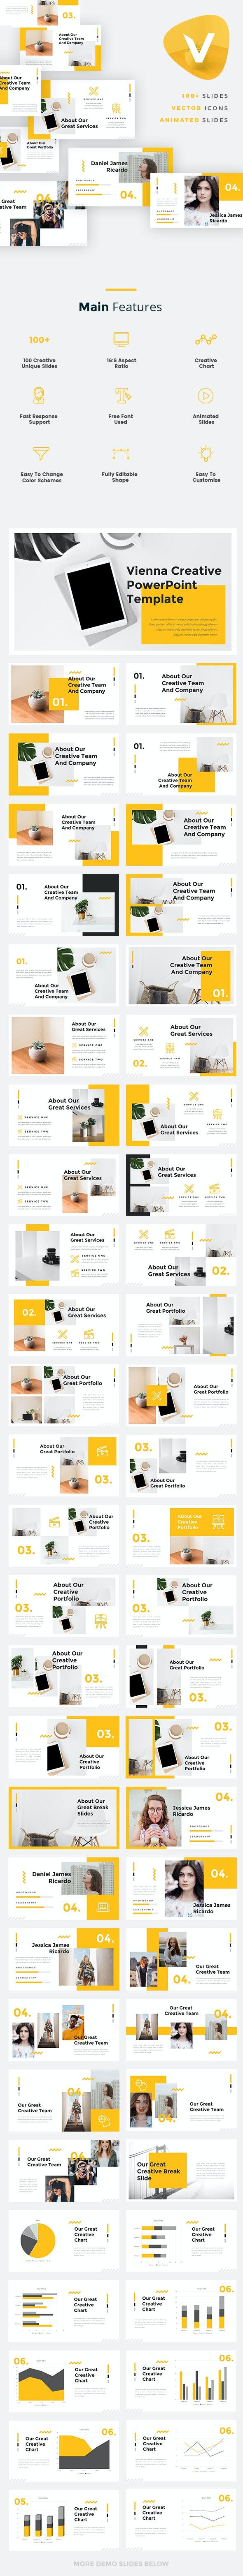 Vienna - Creative Google Slides Template - Google Slides Presentation Templates